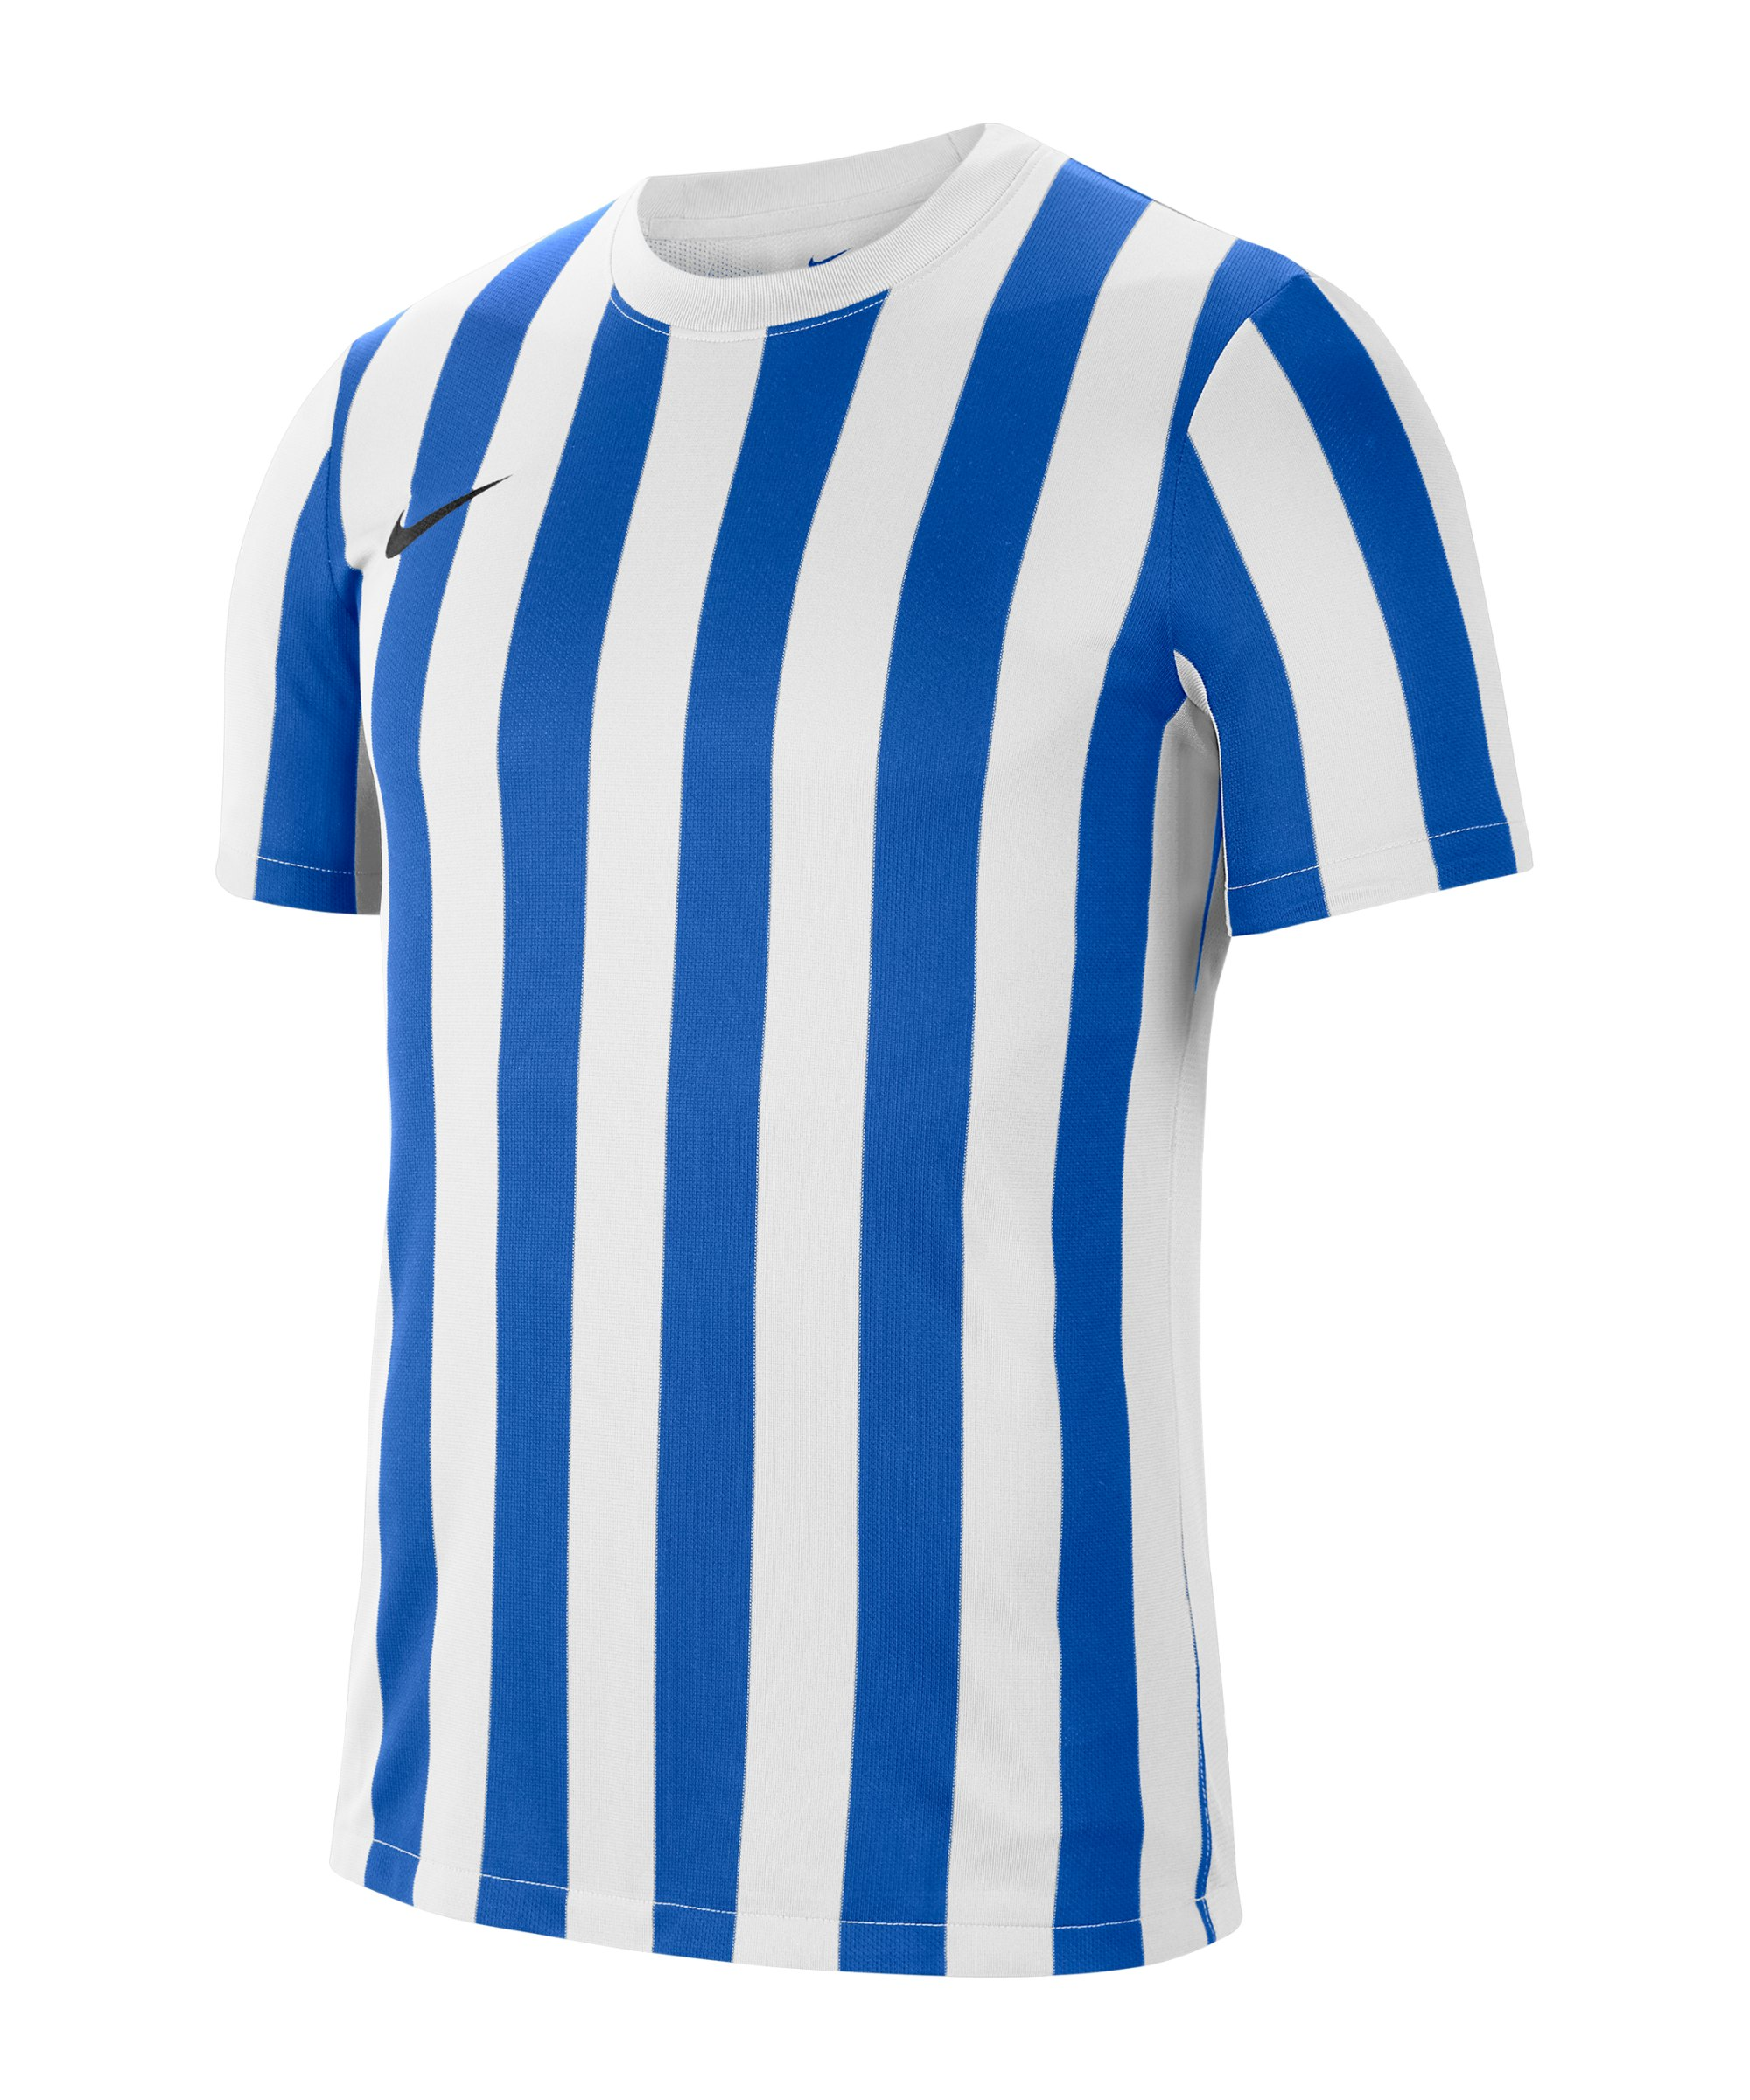 Nike Division IV Striped Trikot kurzarm Weiss F102 - weiss